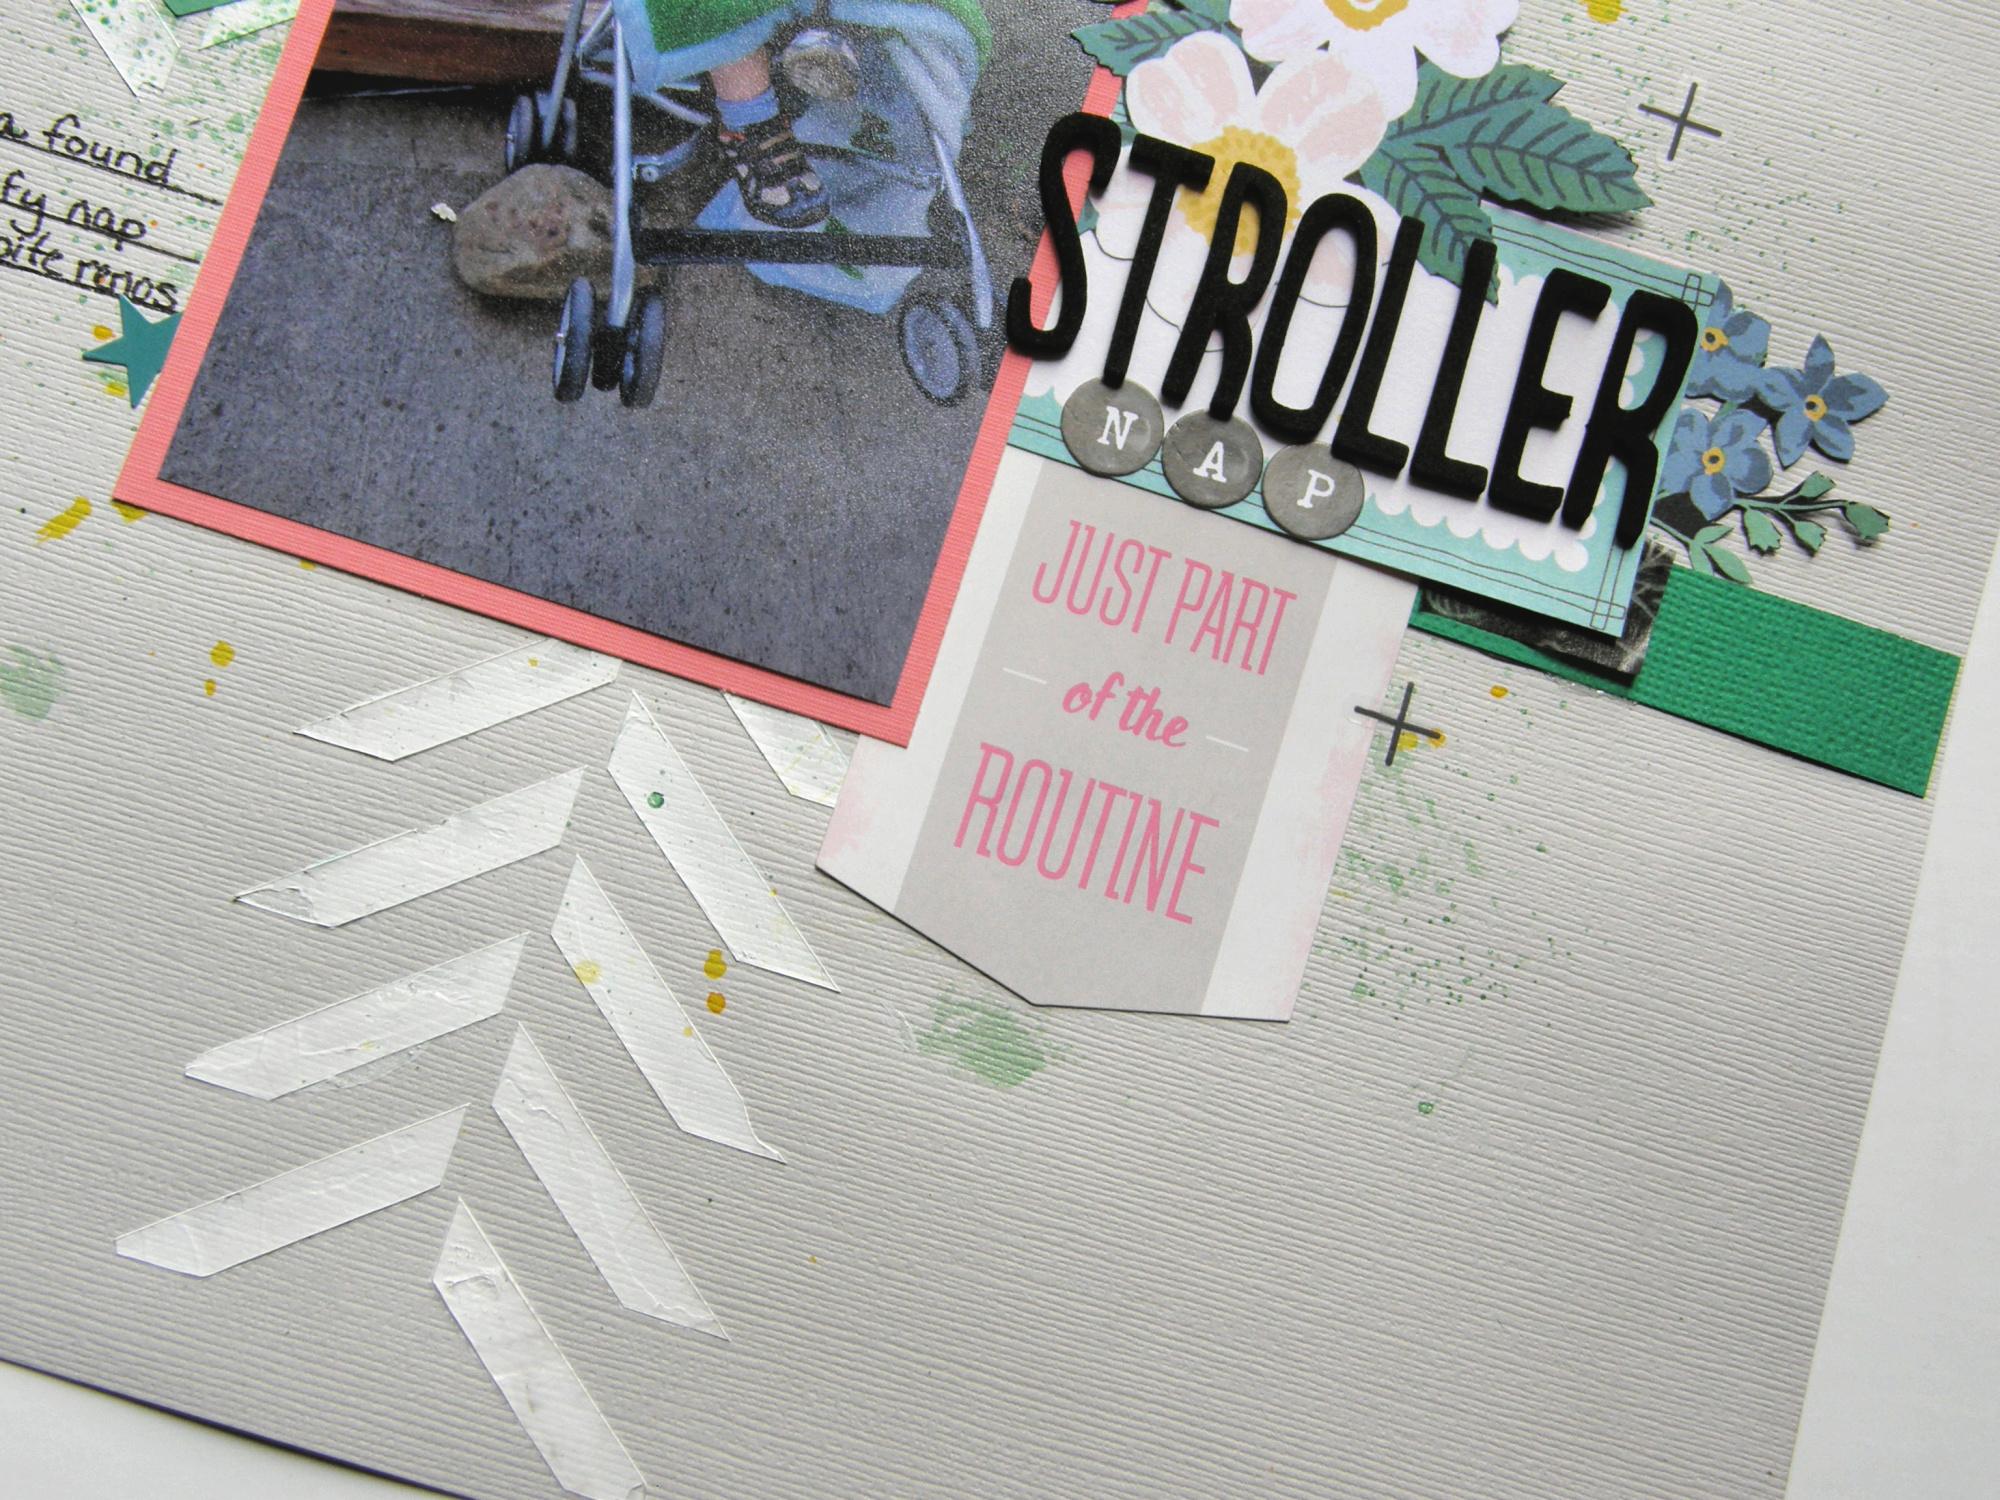 StrollerNap3_AMcGrew.jpg